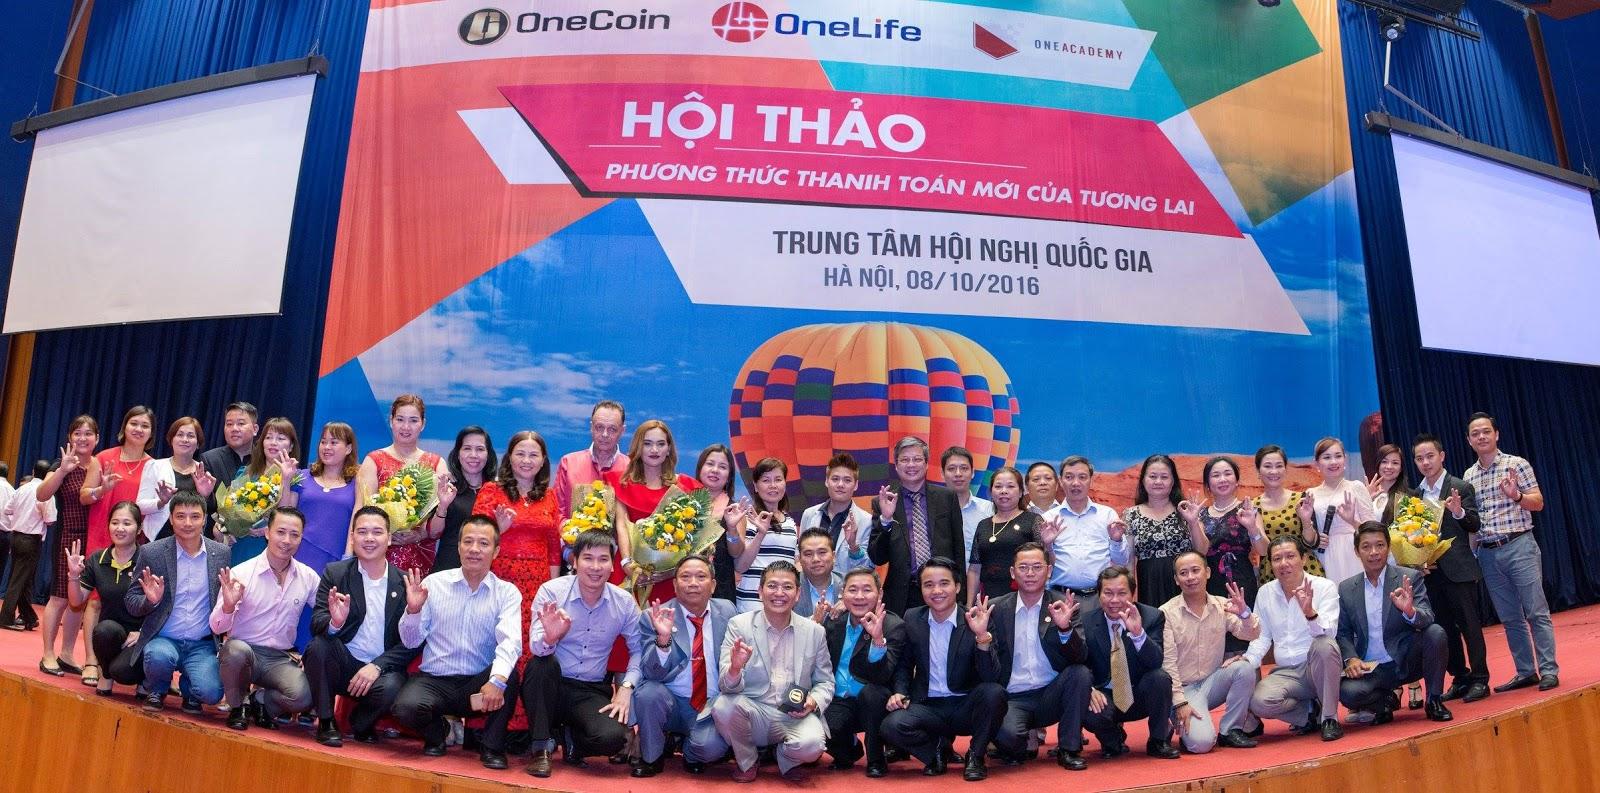 Ponzi-like OneCoin trading scheme swindles many in Vietnam